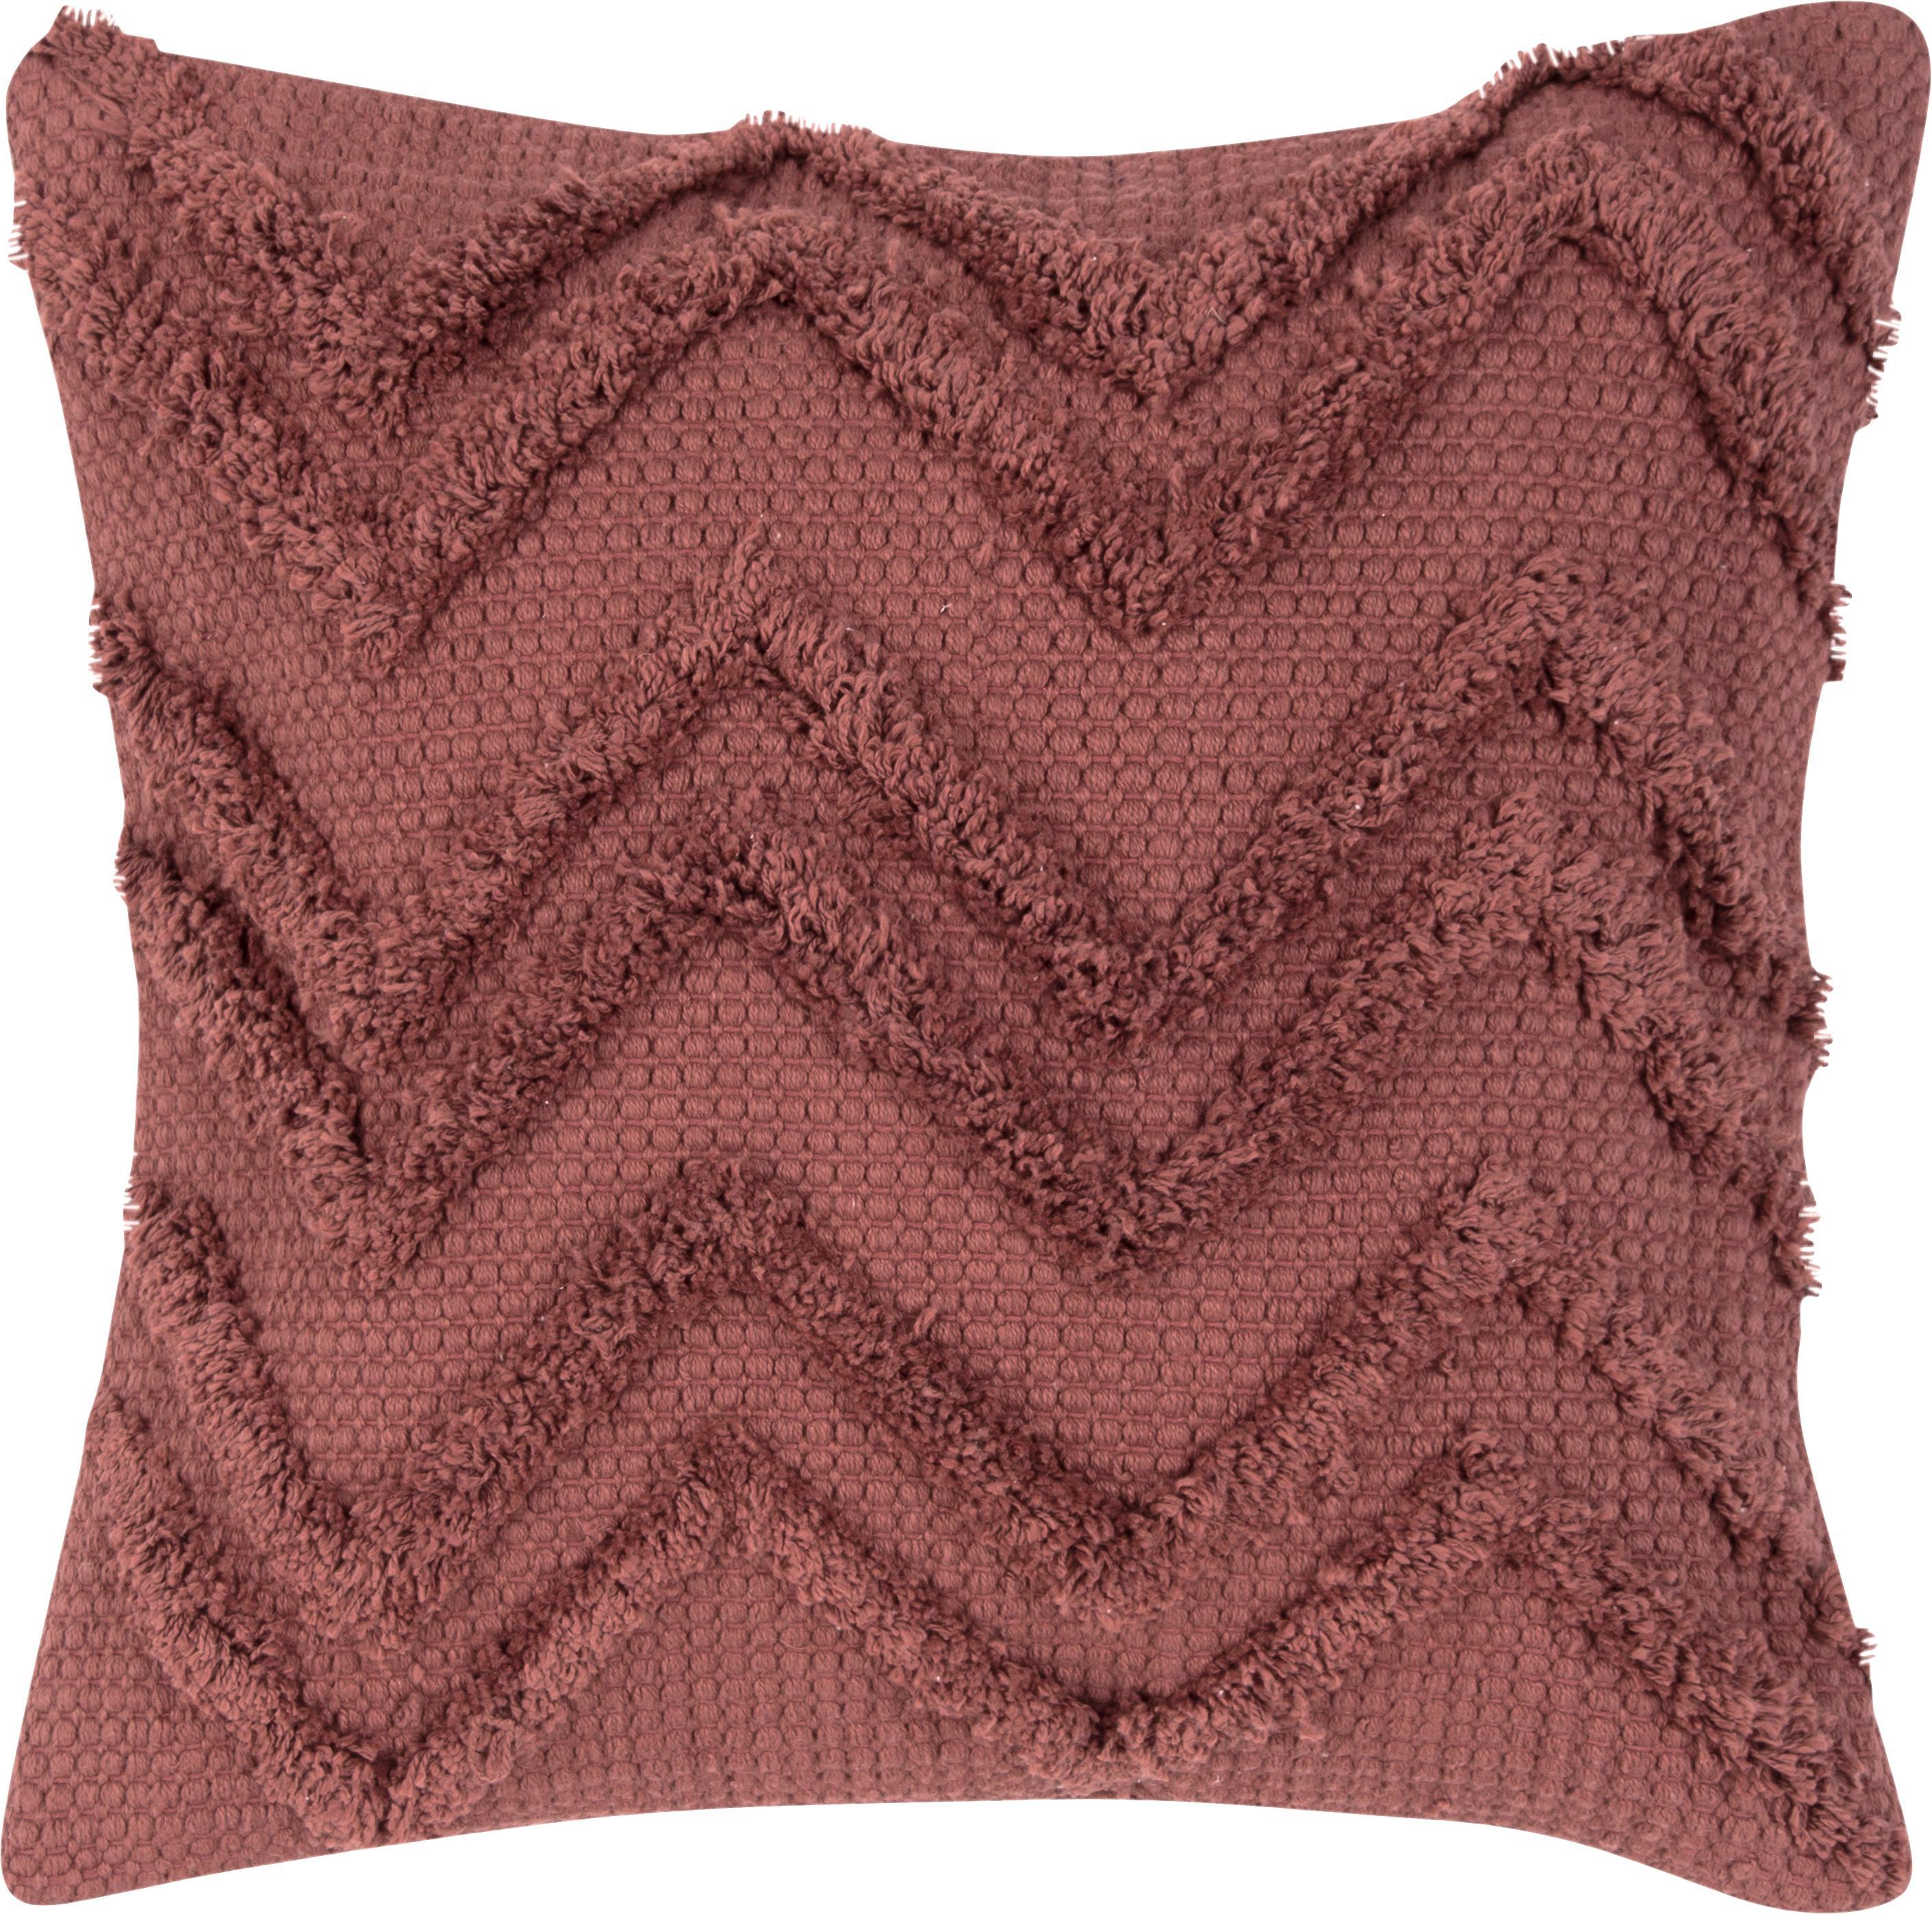 Poszewka na poduszkę Akesha, 100% bawełna, Rudy, S 45 x D 45 cm